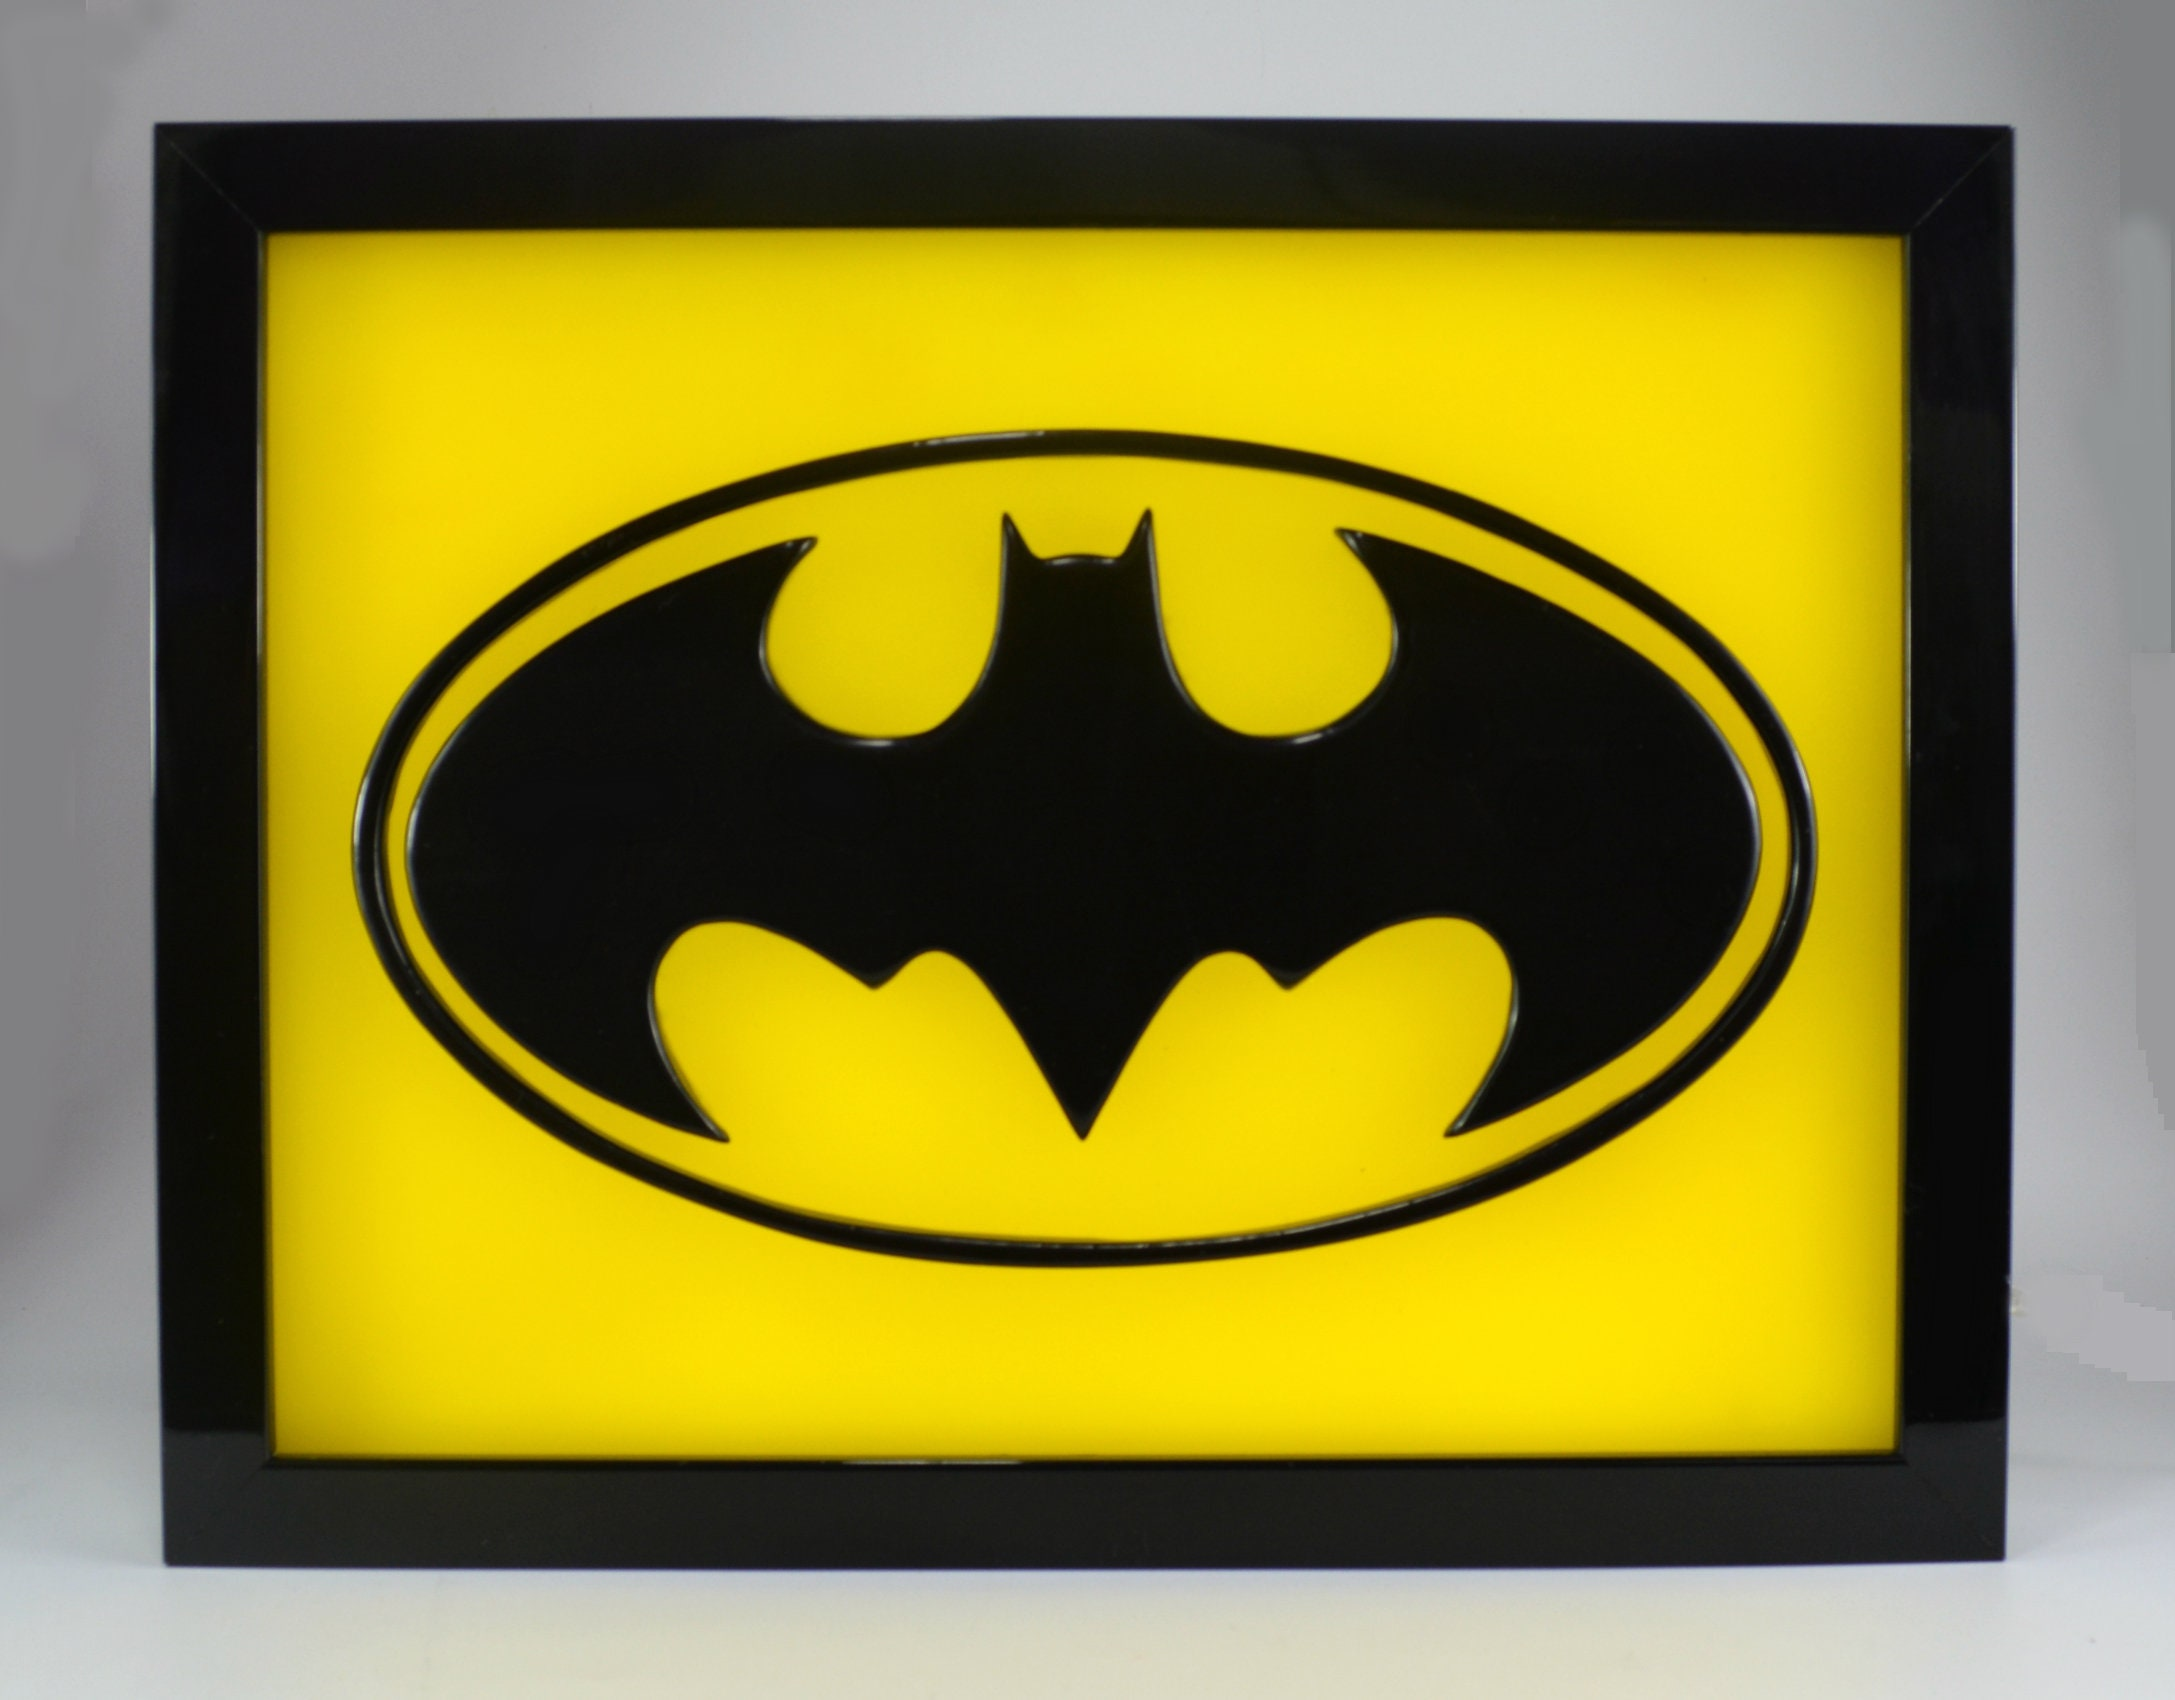 The Batman symbol logo wax painting led light box